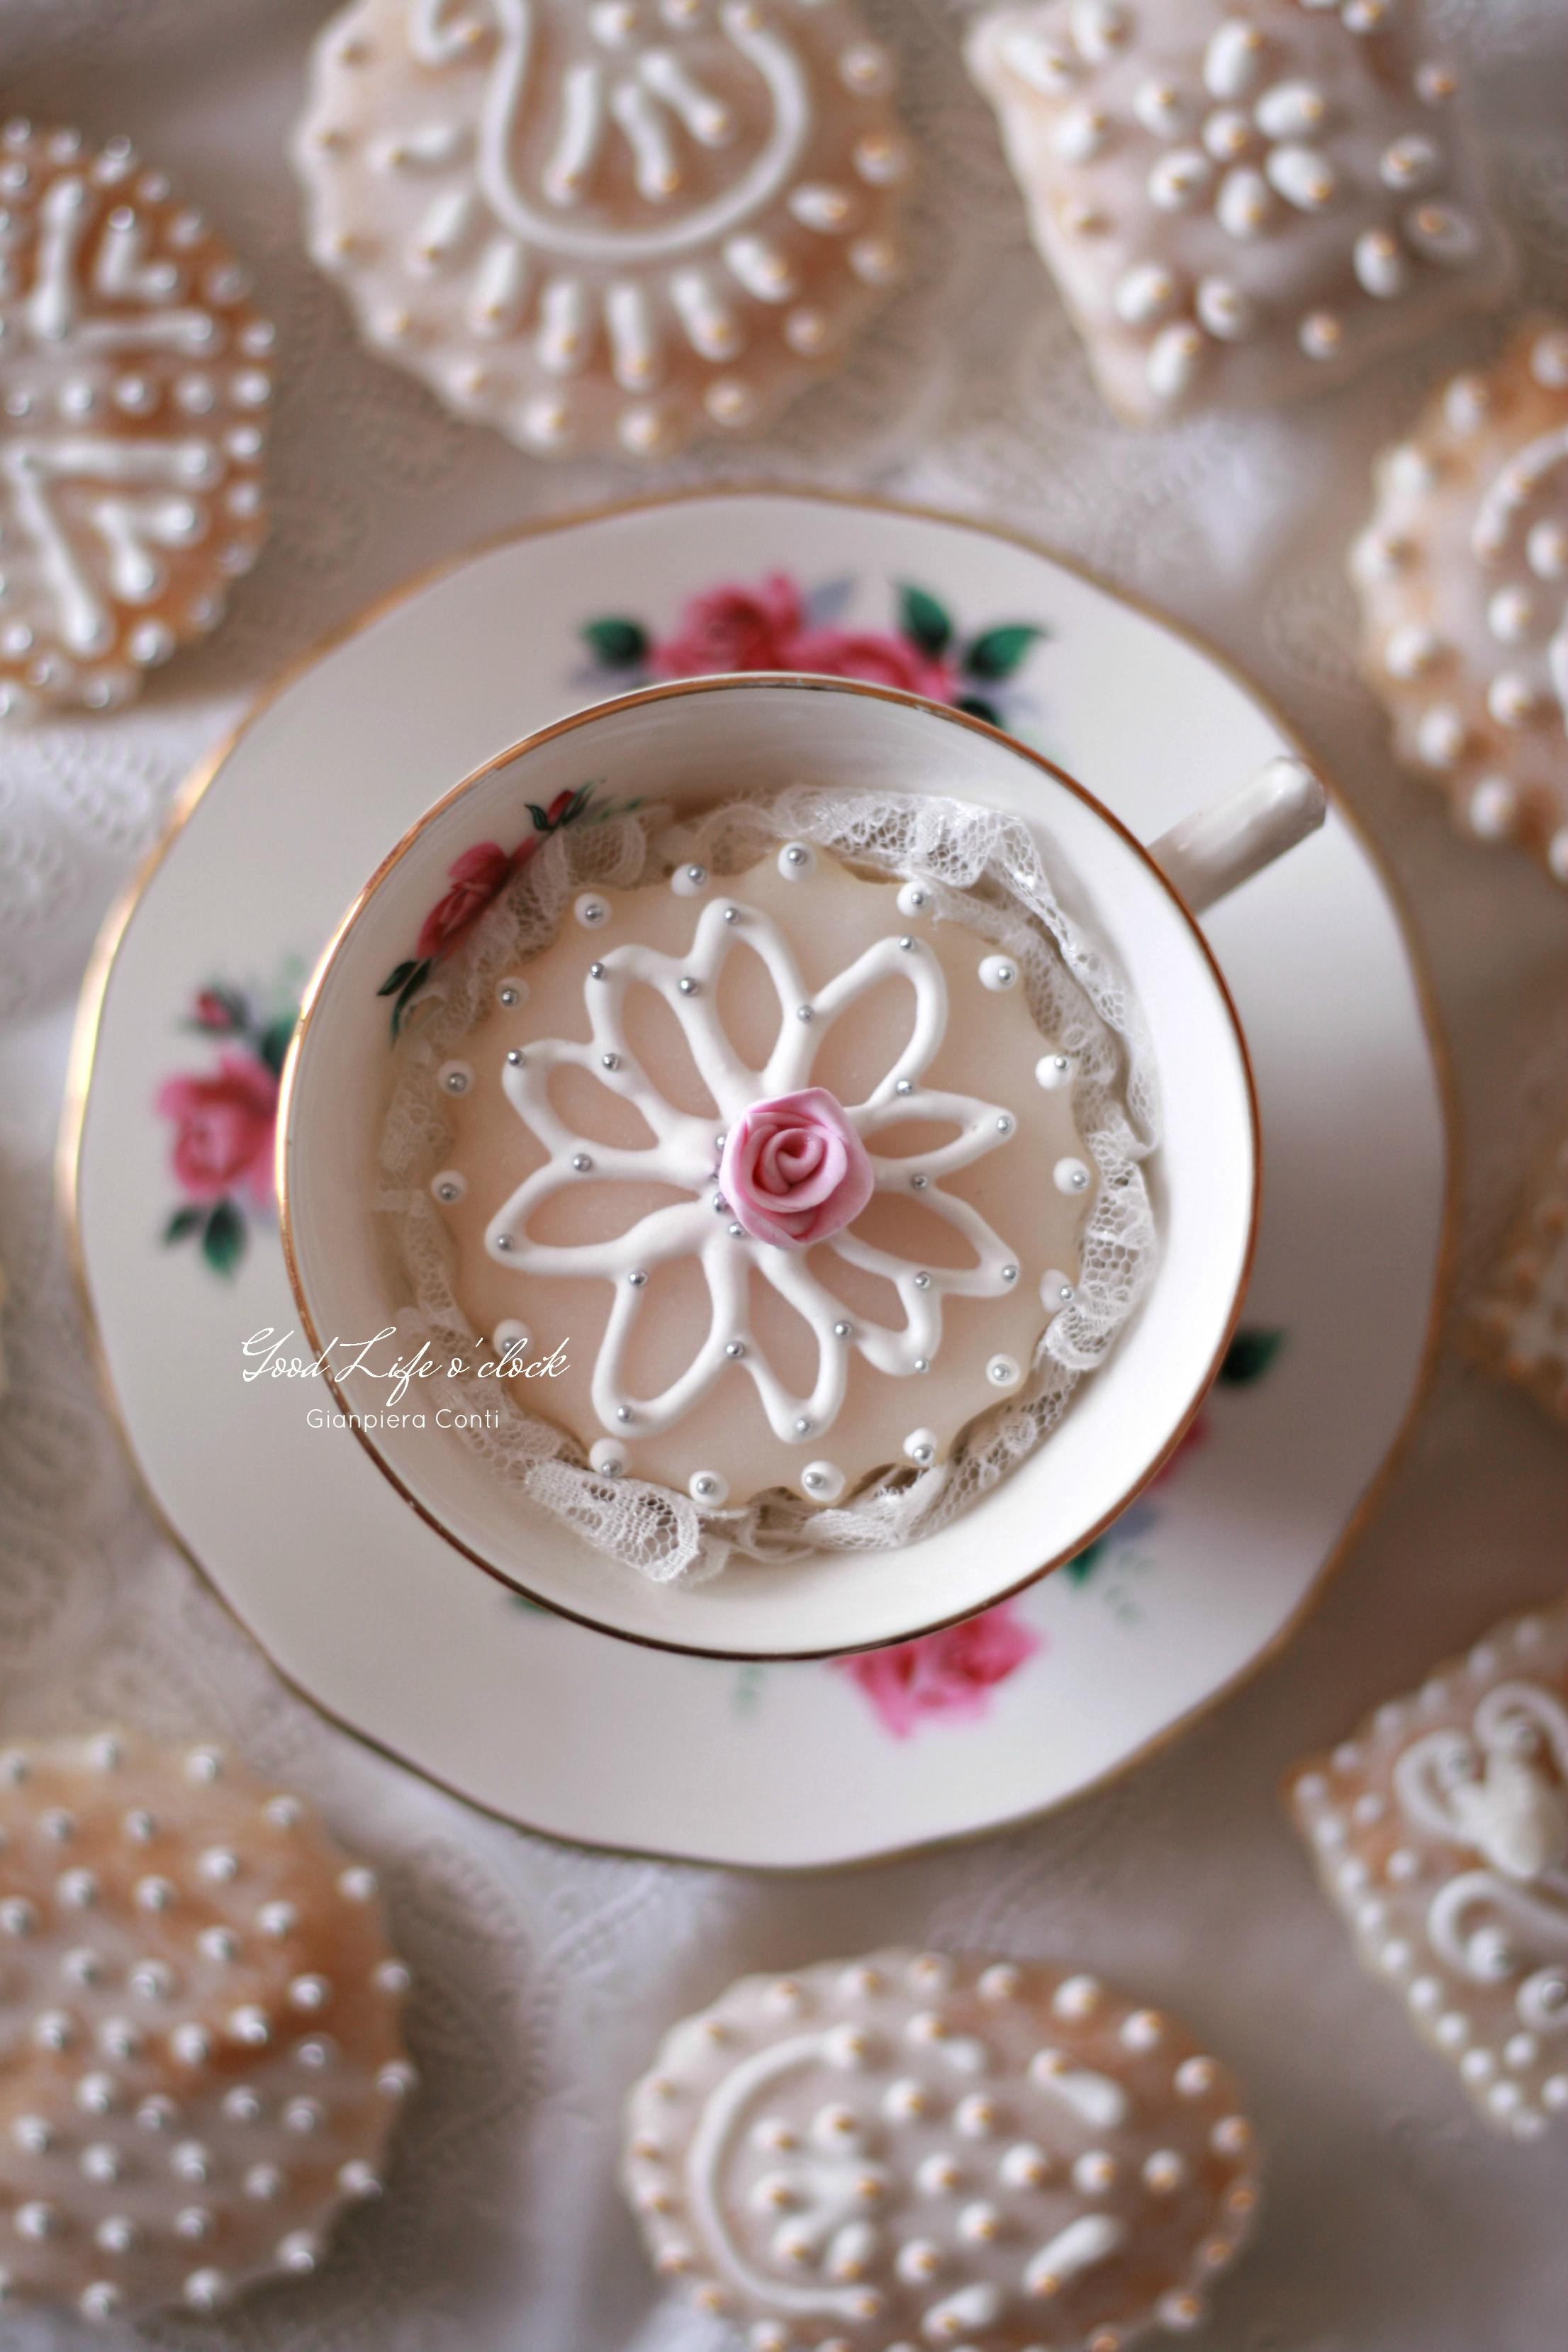 Pastissus Rose in a cup GLOC GC 2